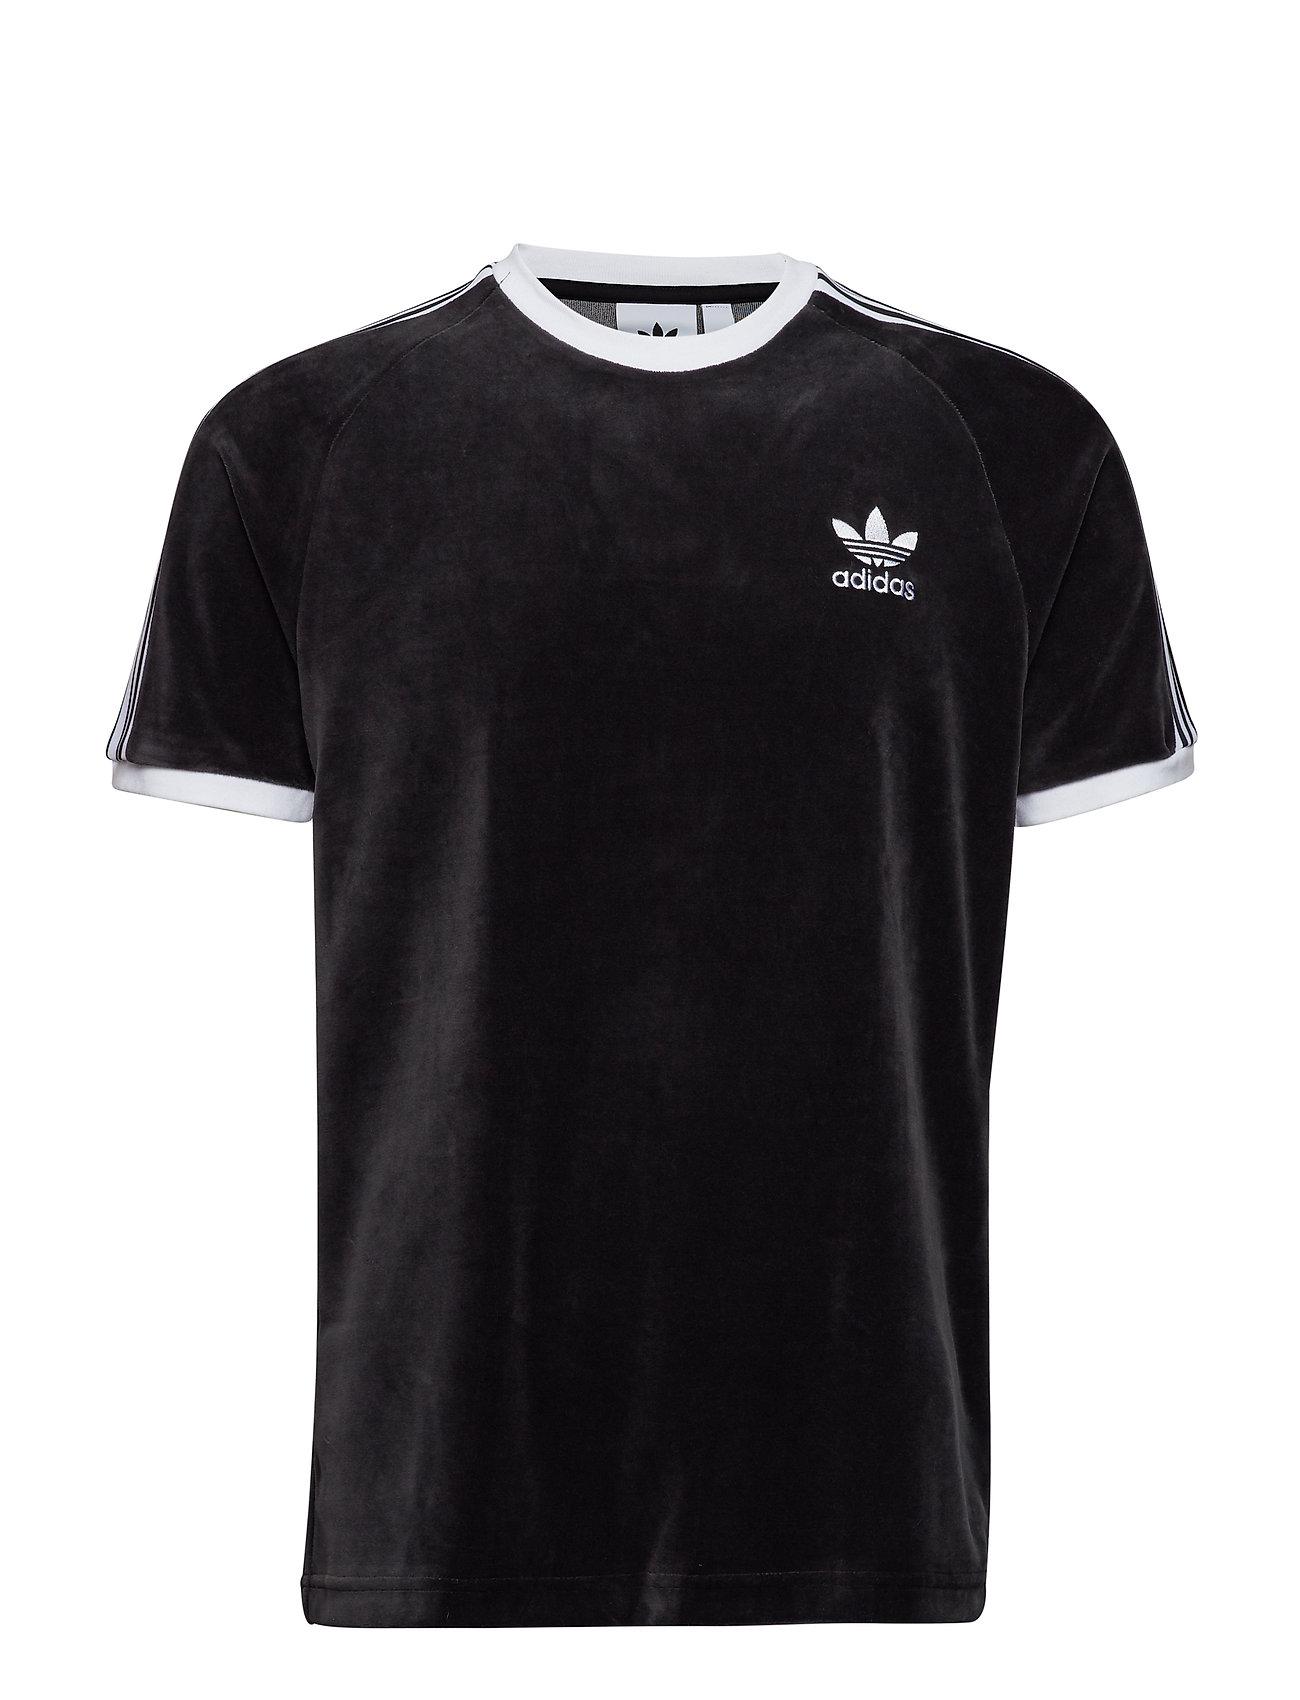 Adidas Originals COZY TEE Ögrönlar